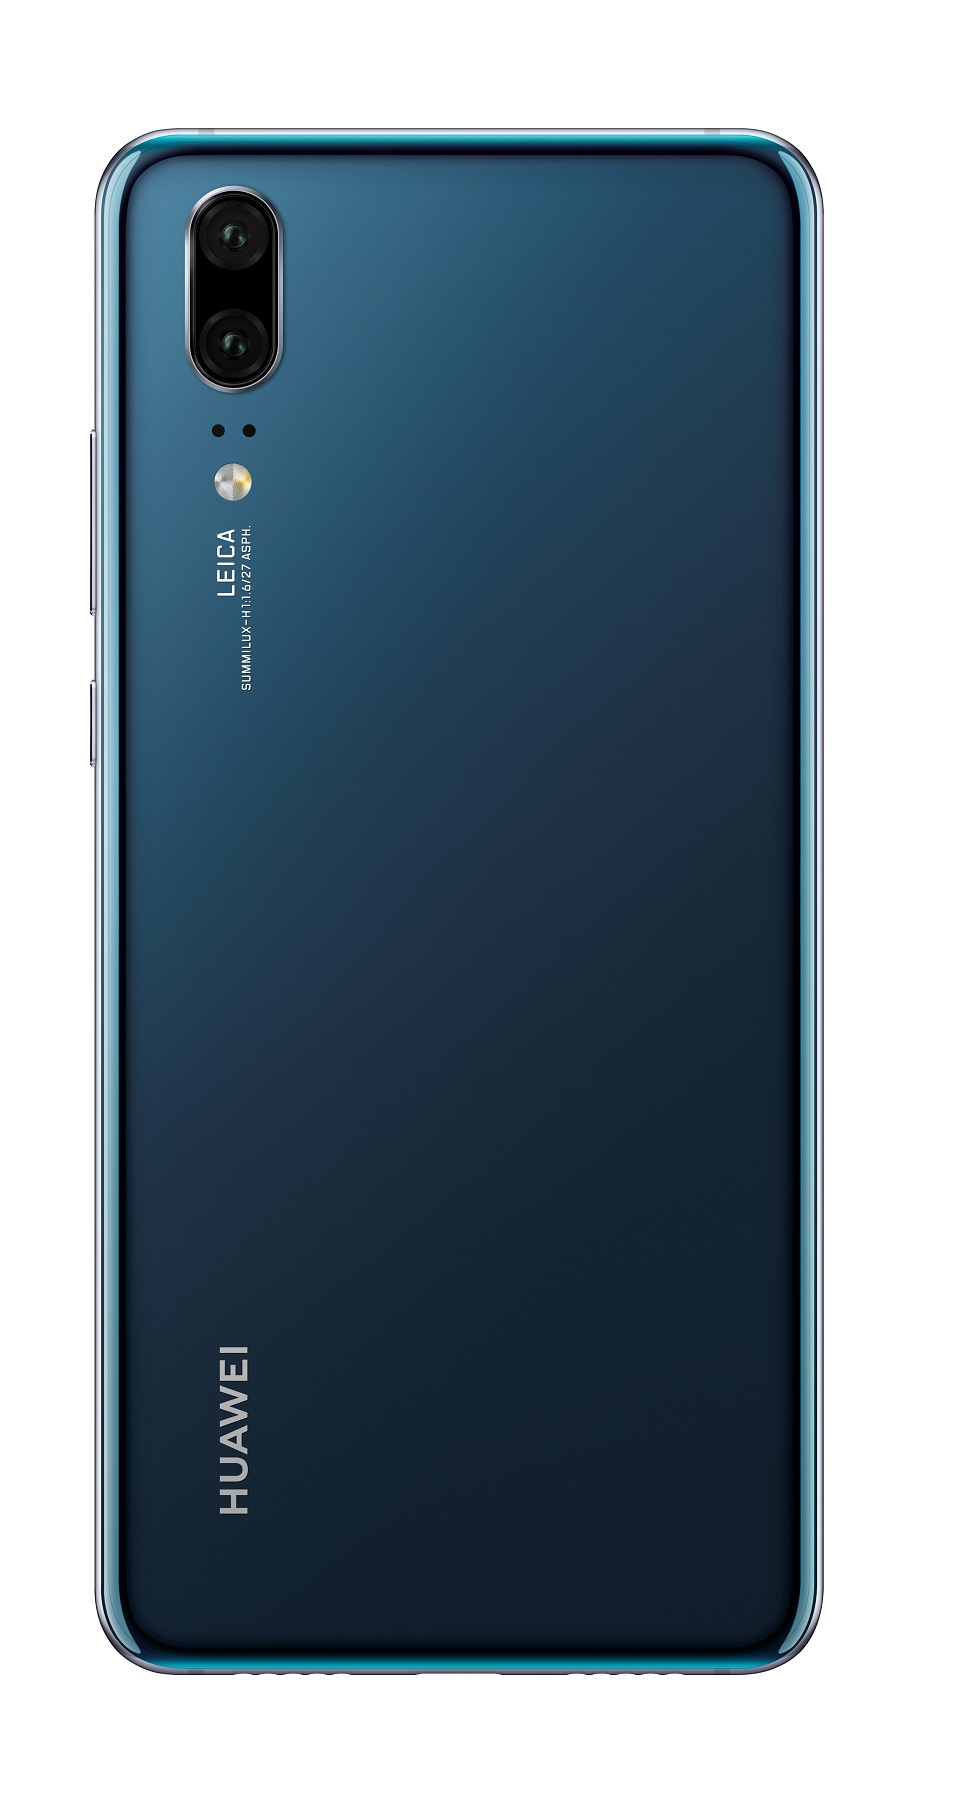 Chytrý telefon Huawei P20 Blue